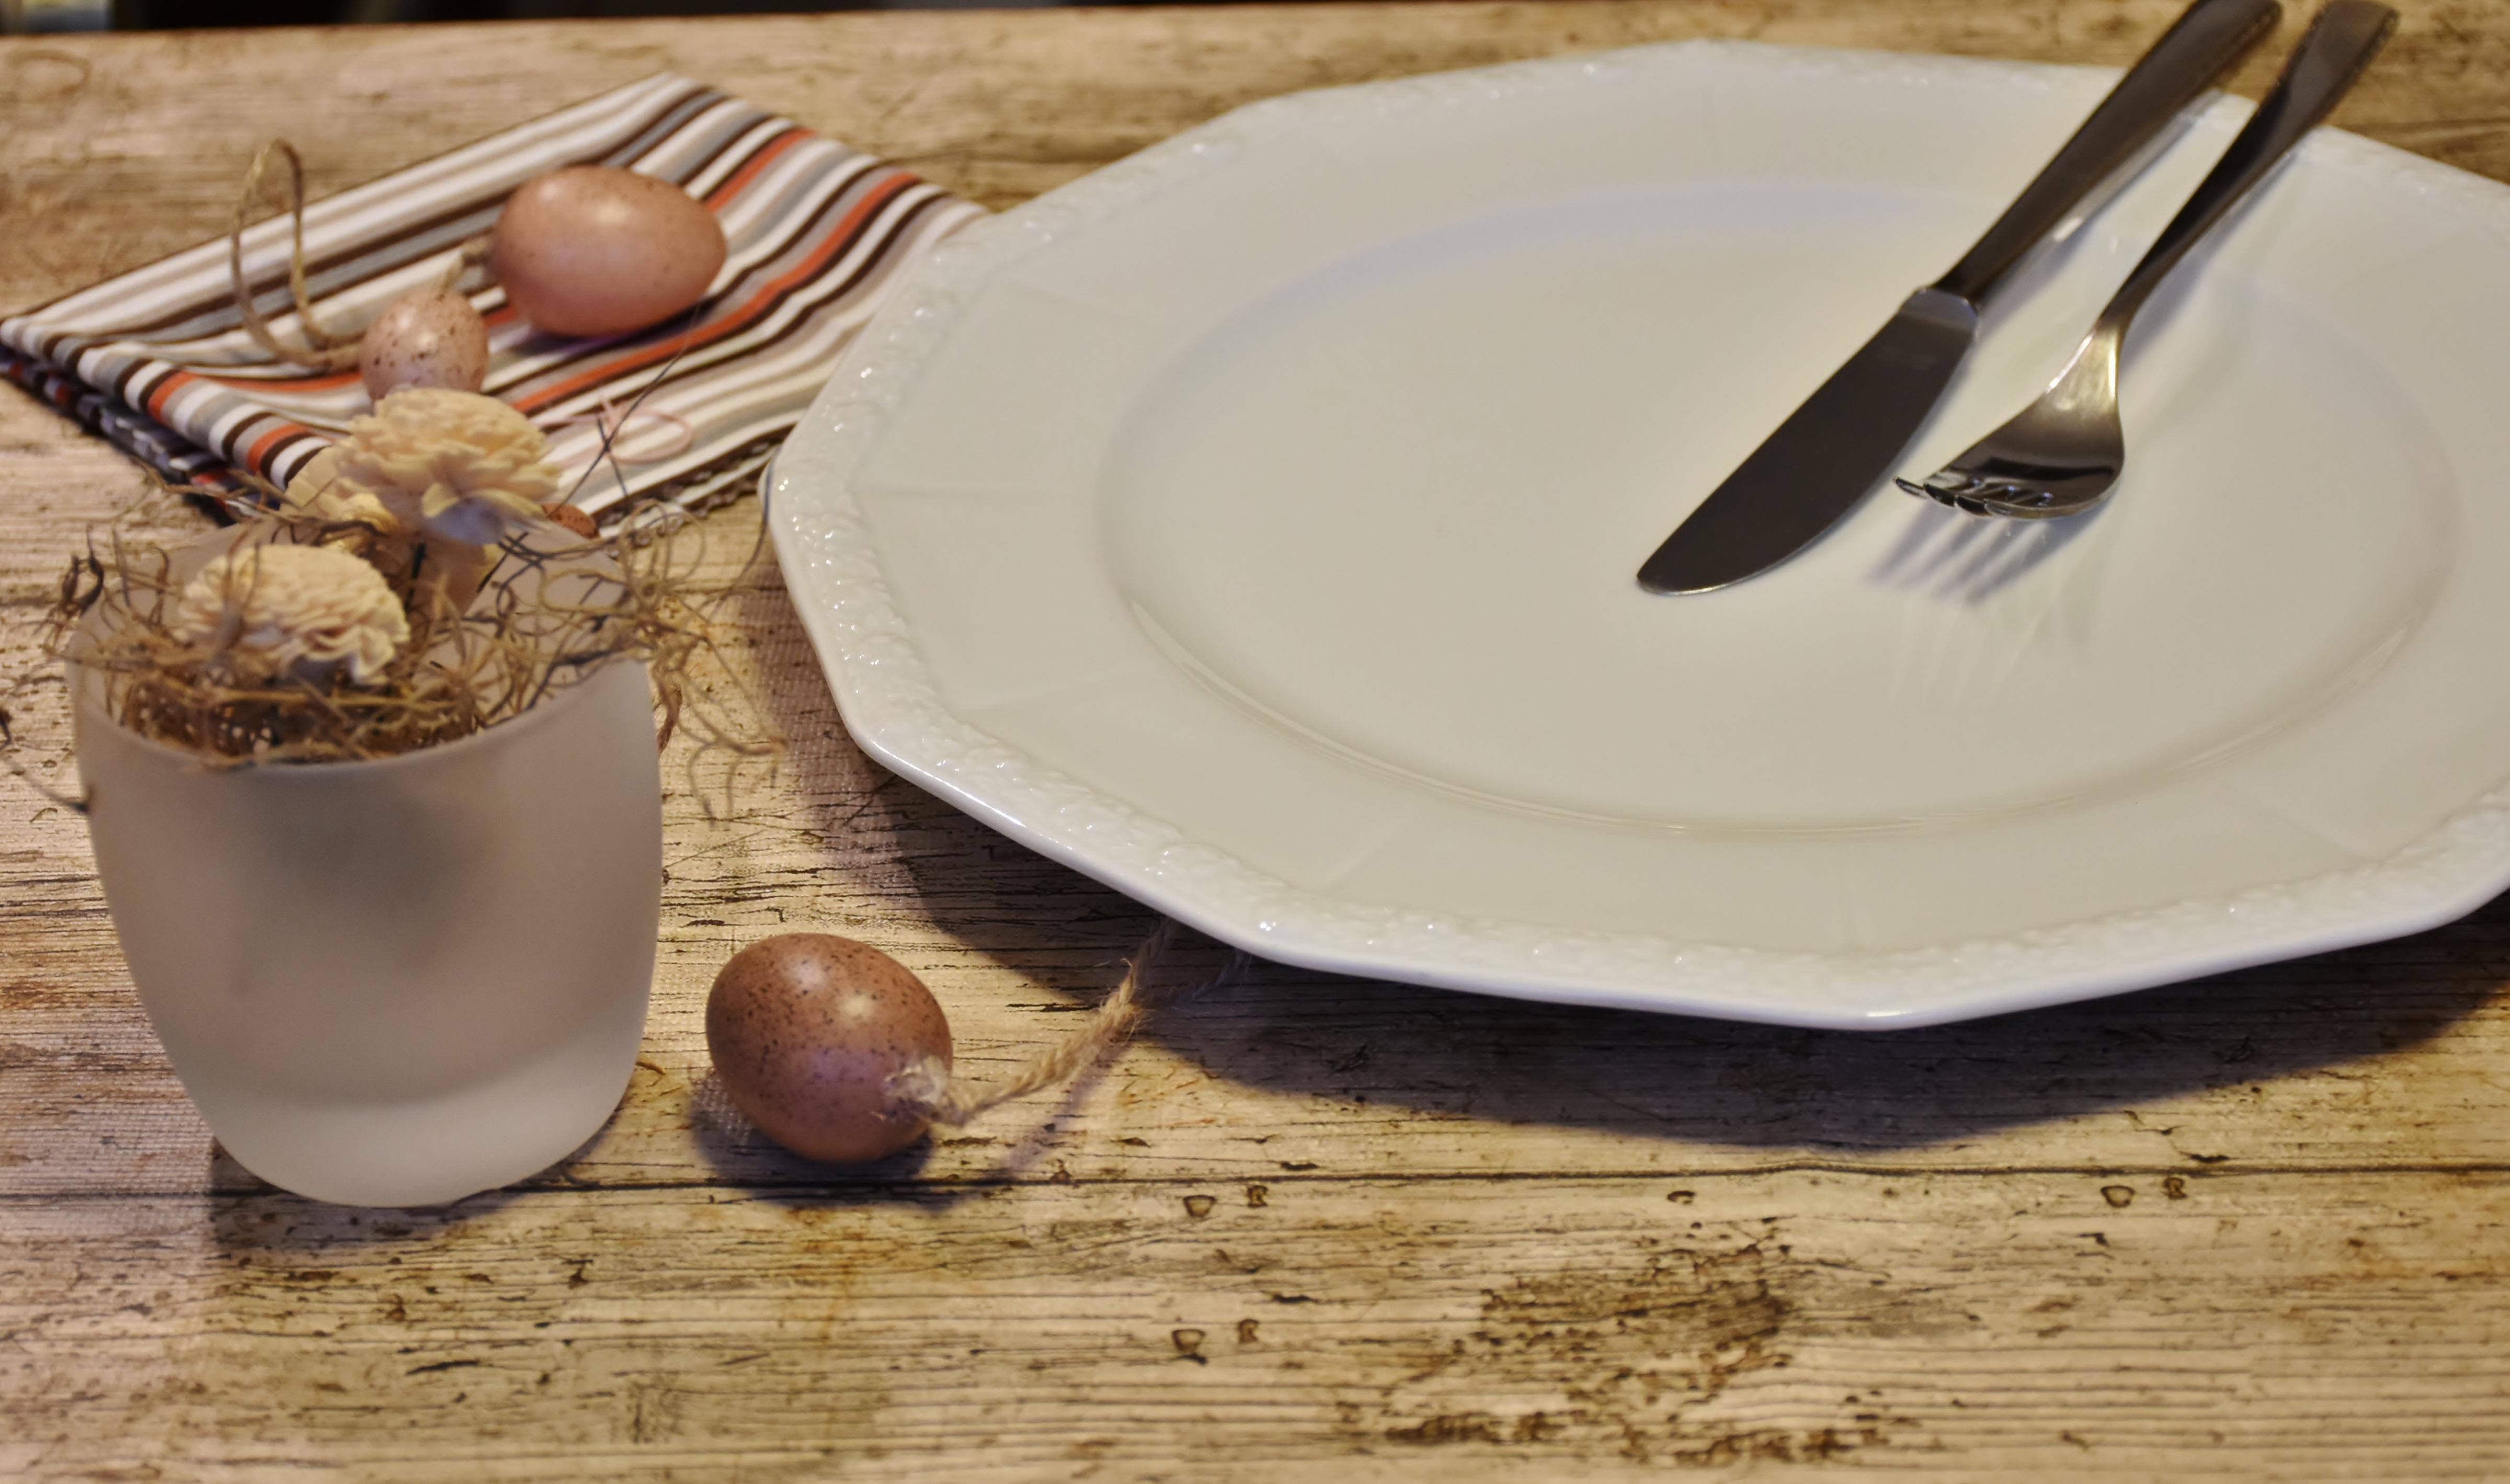 Table Fork Cutlery Board Dish Meal Food Produce Plate Empty Breakfast Baking  Decor Tableware Knife Coconut